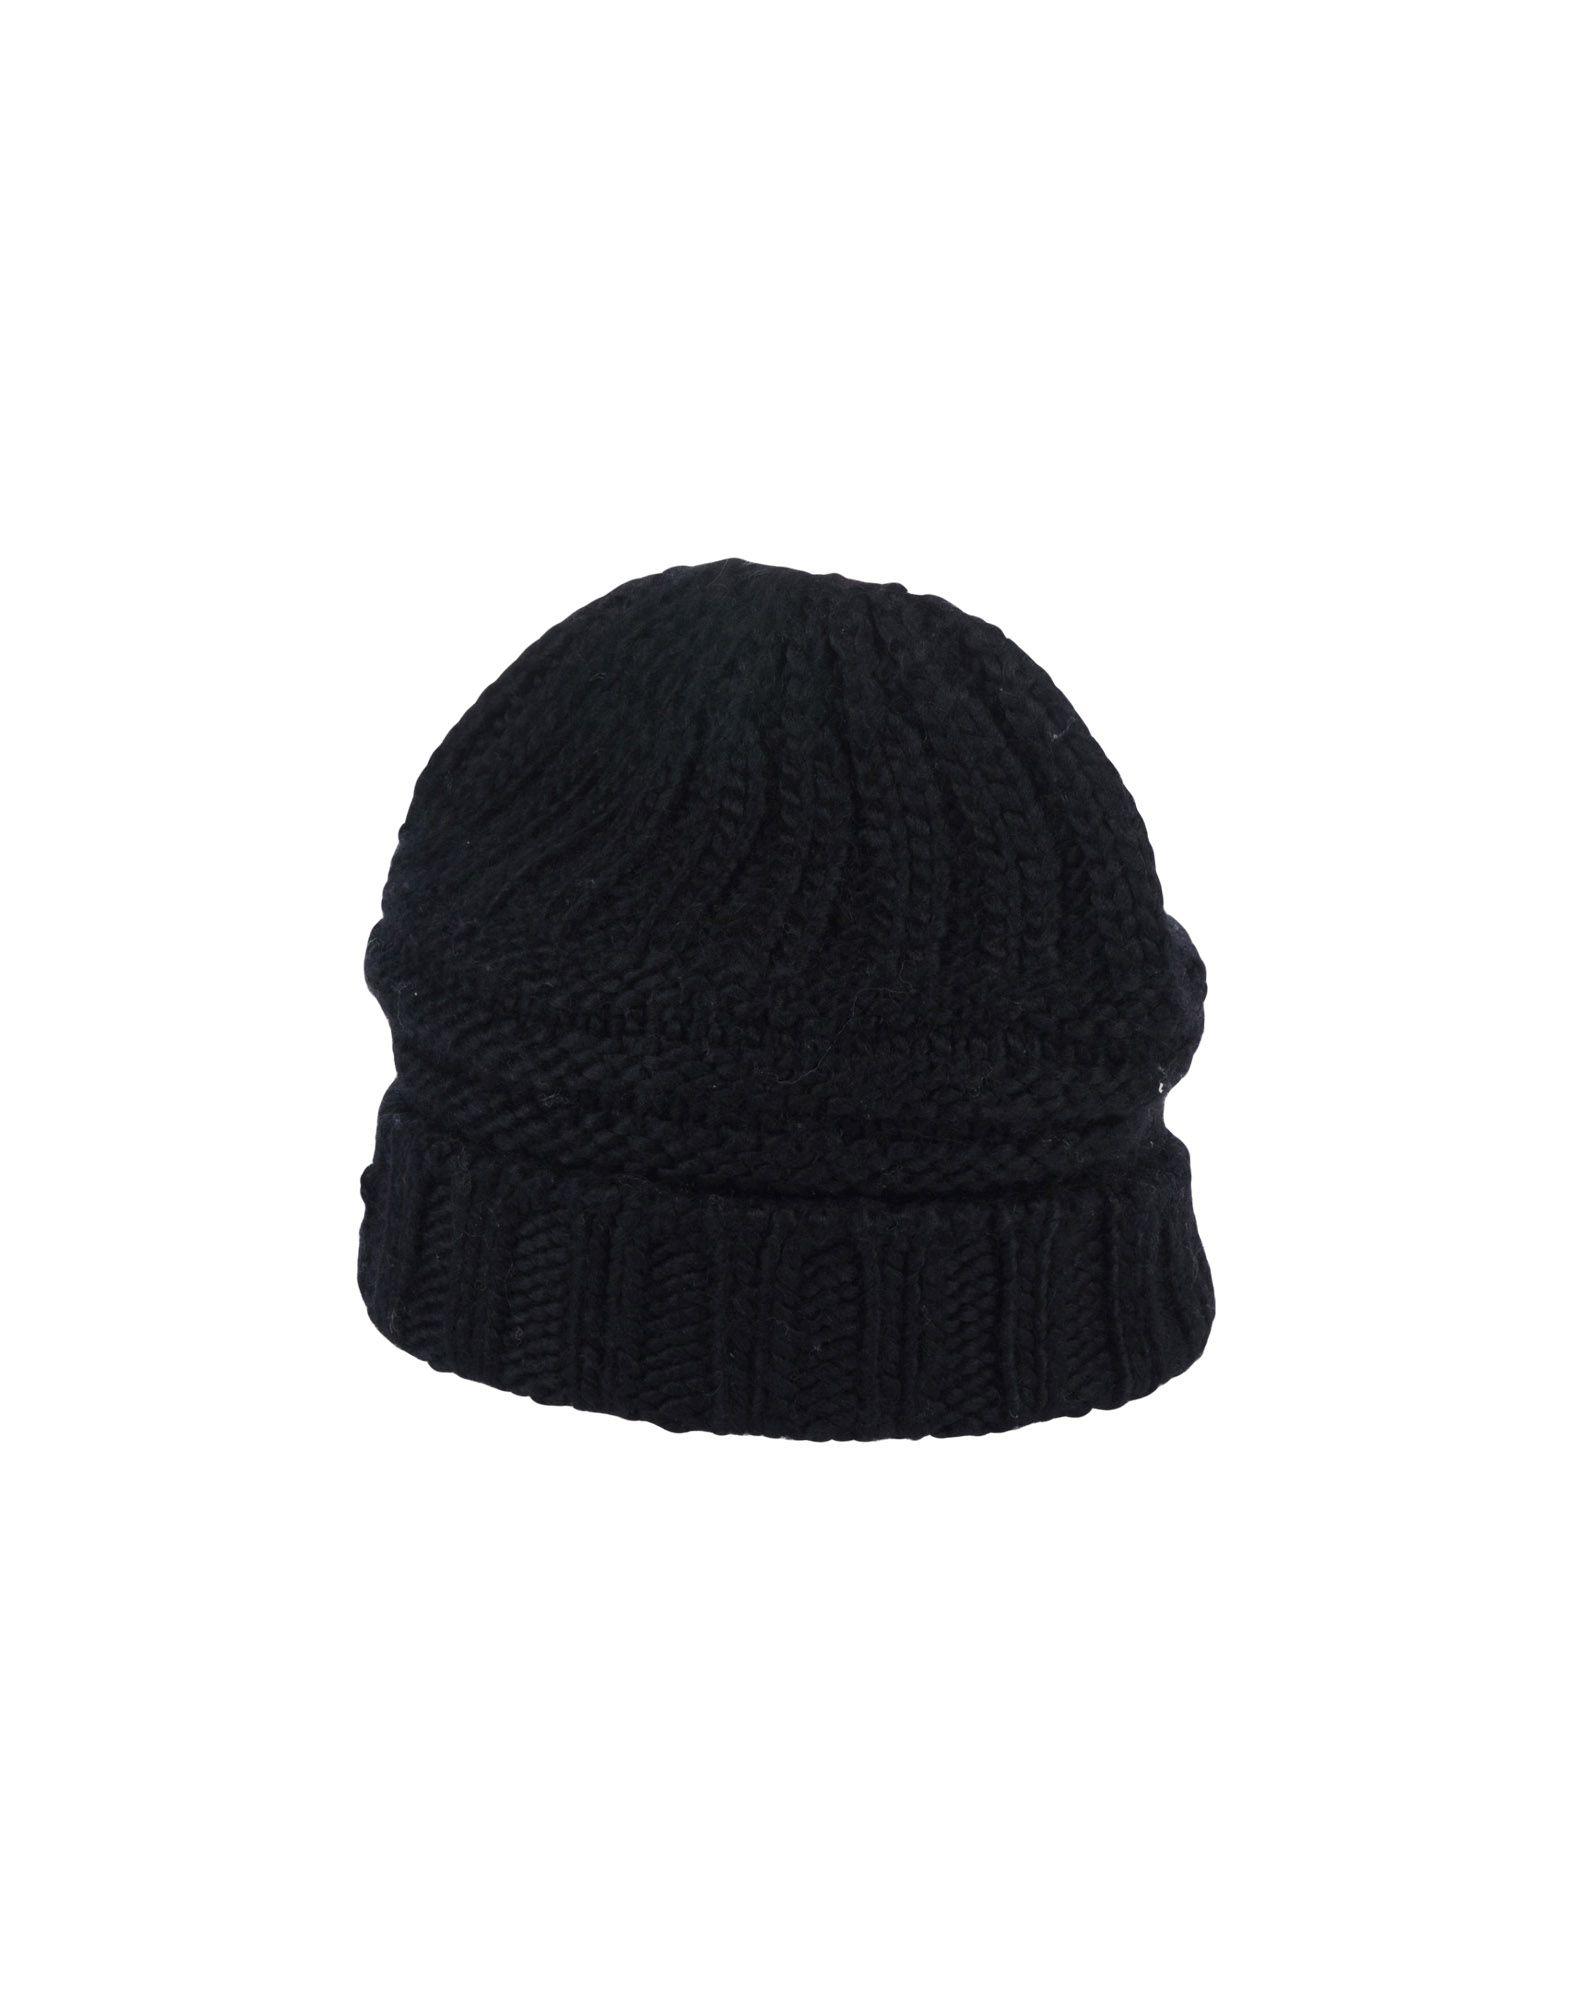 Adidas Hat - Women Adidas Hats online on YOOX Belgium - 46590838WP 3886195b4782